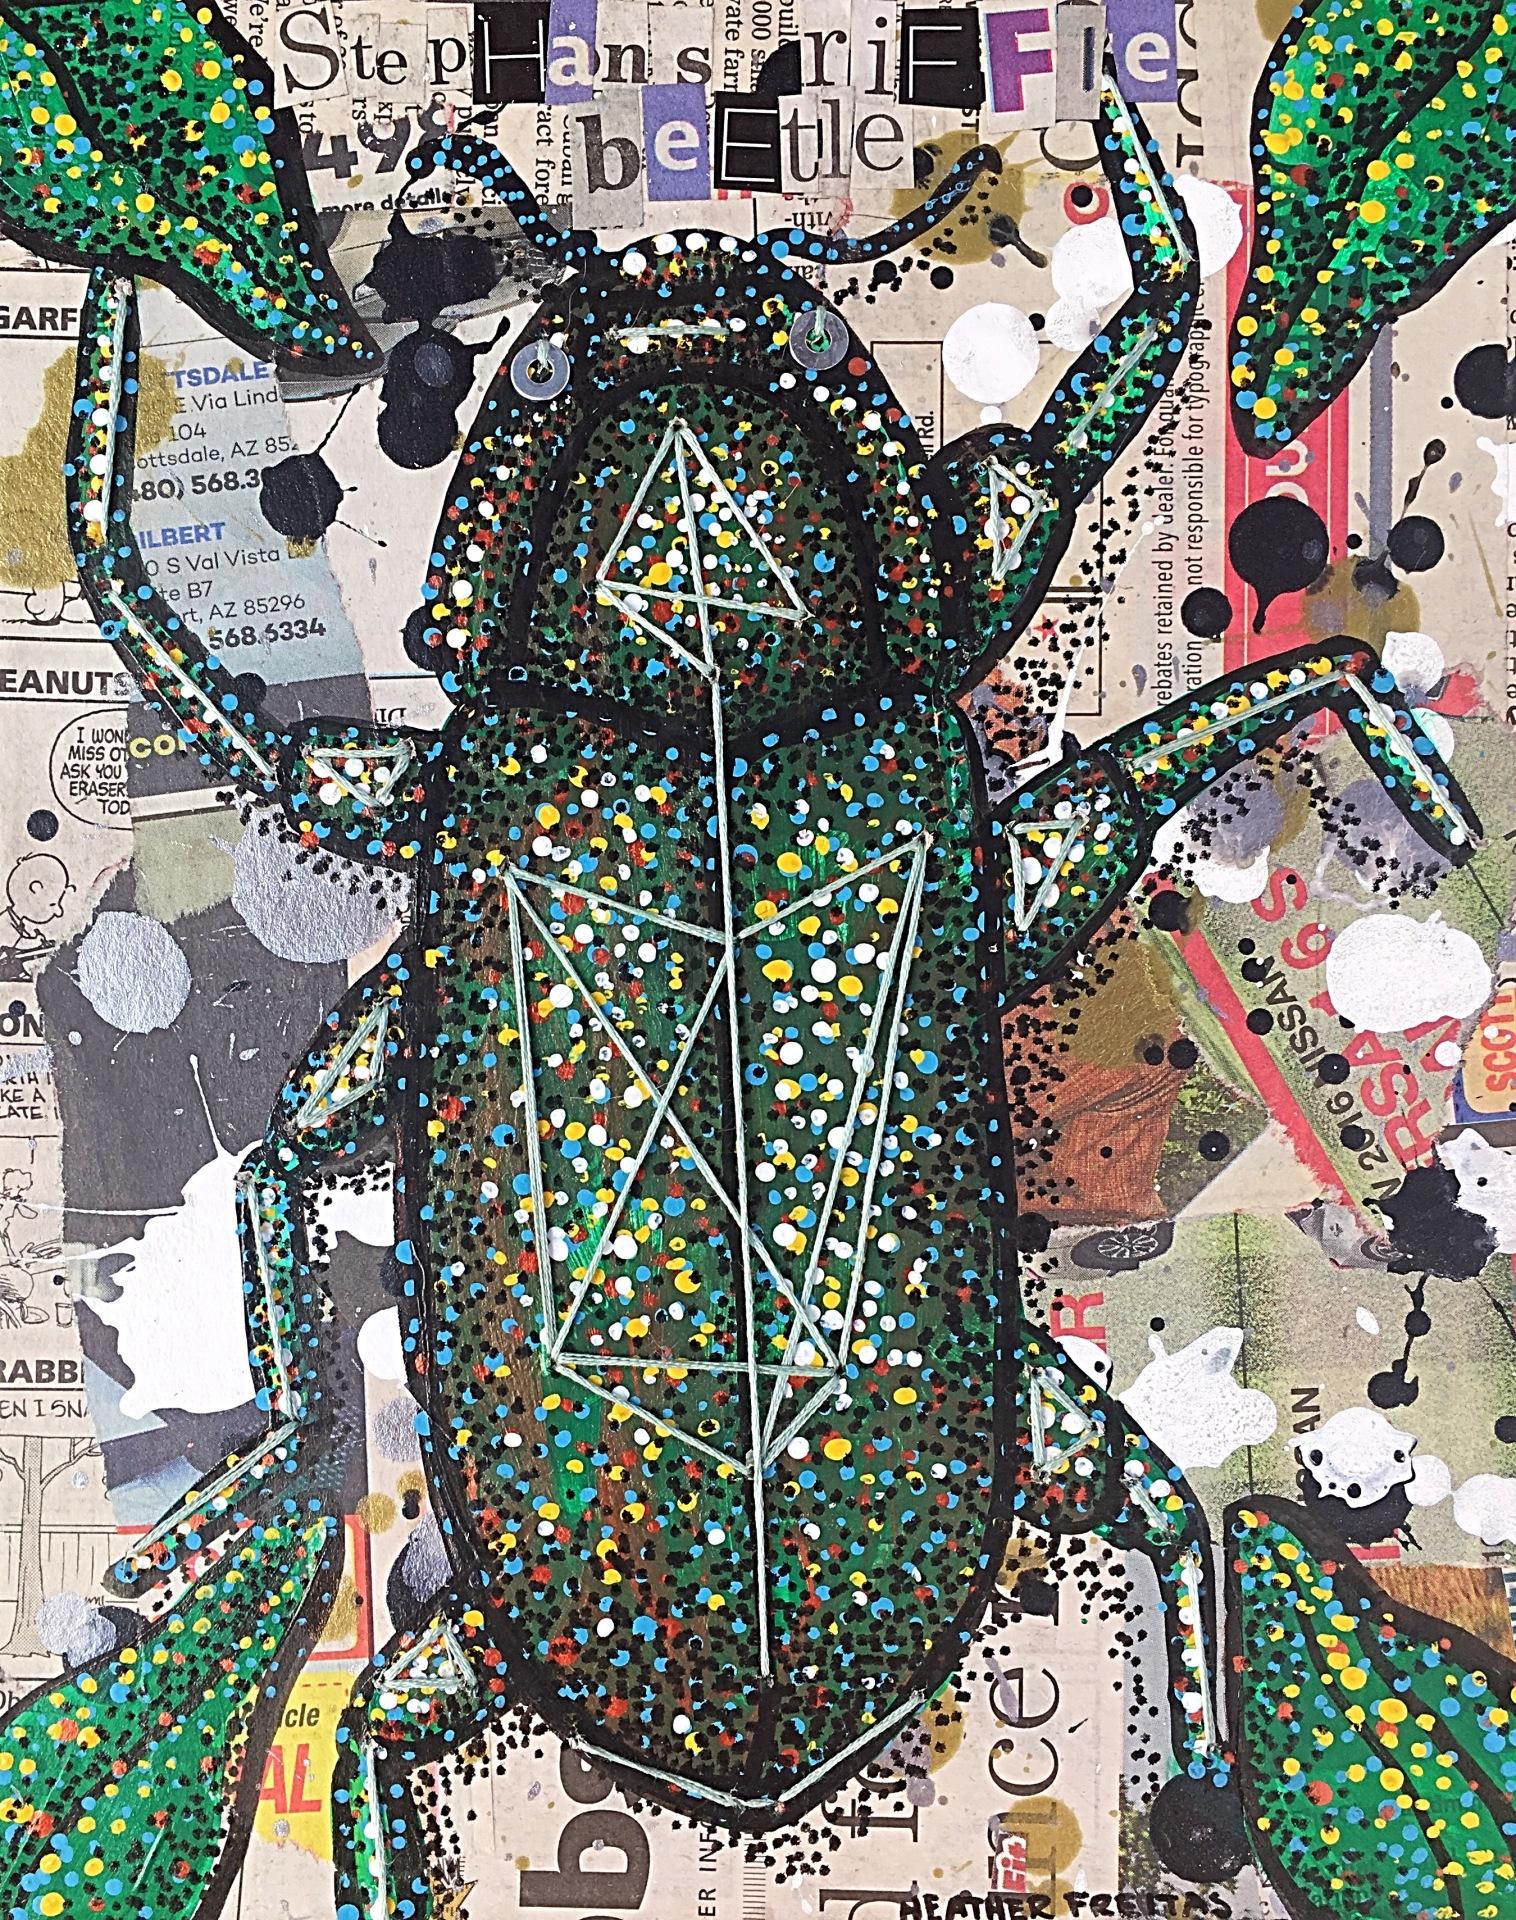 Stephans Riffle Beetle